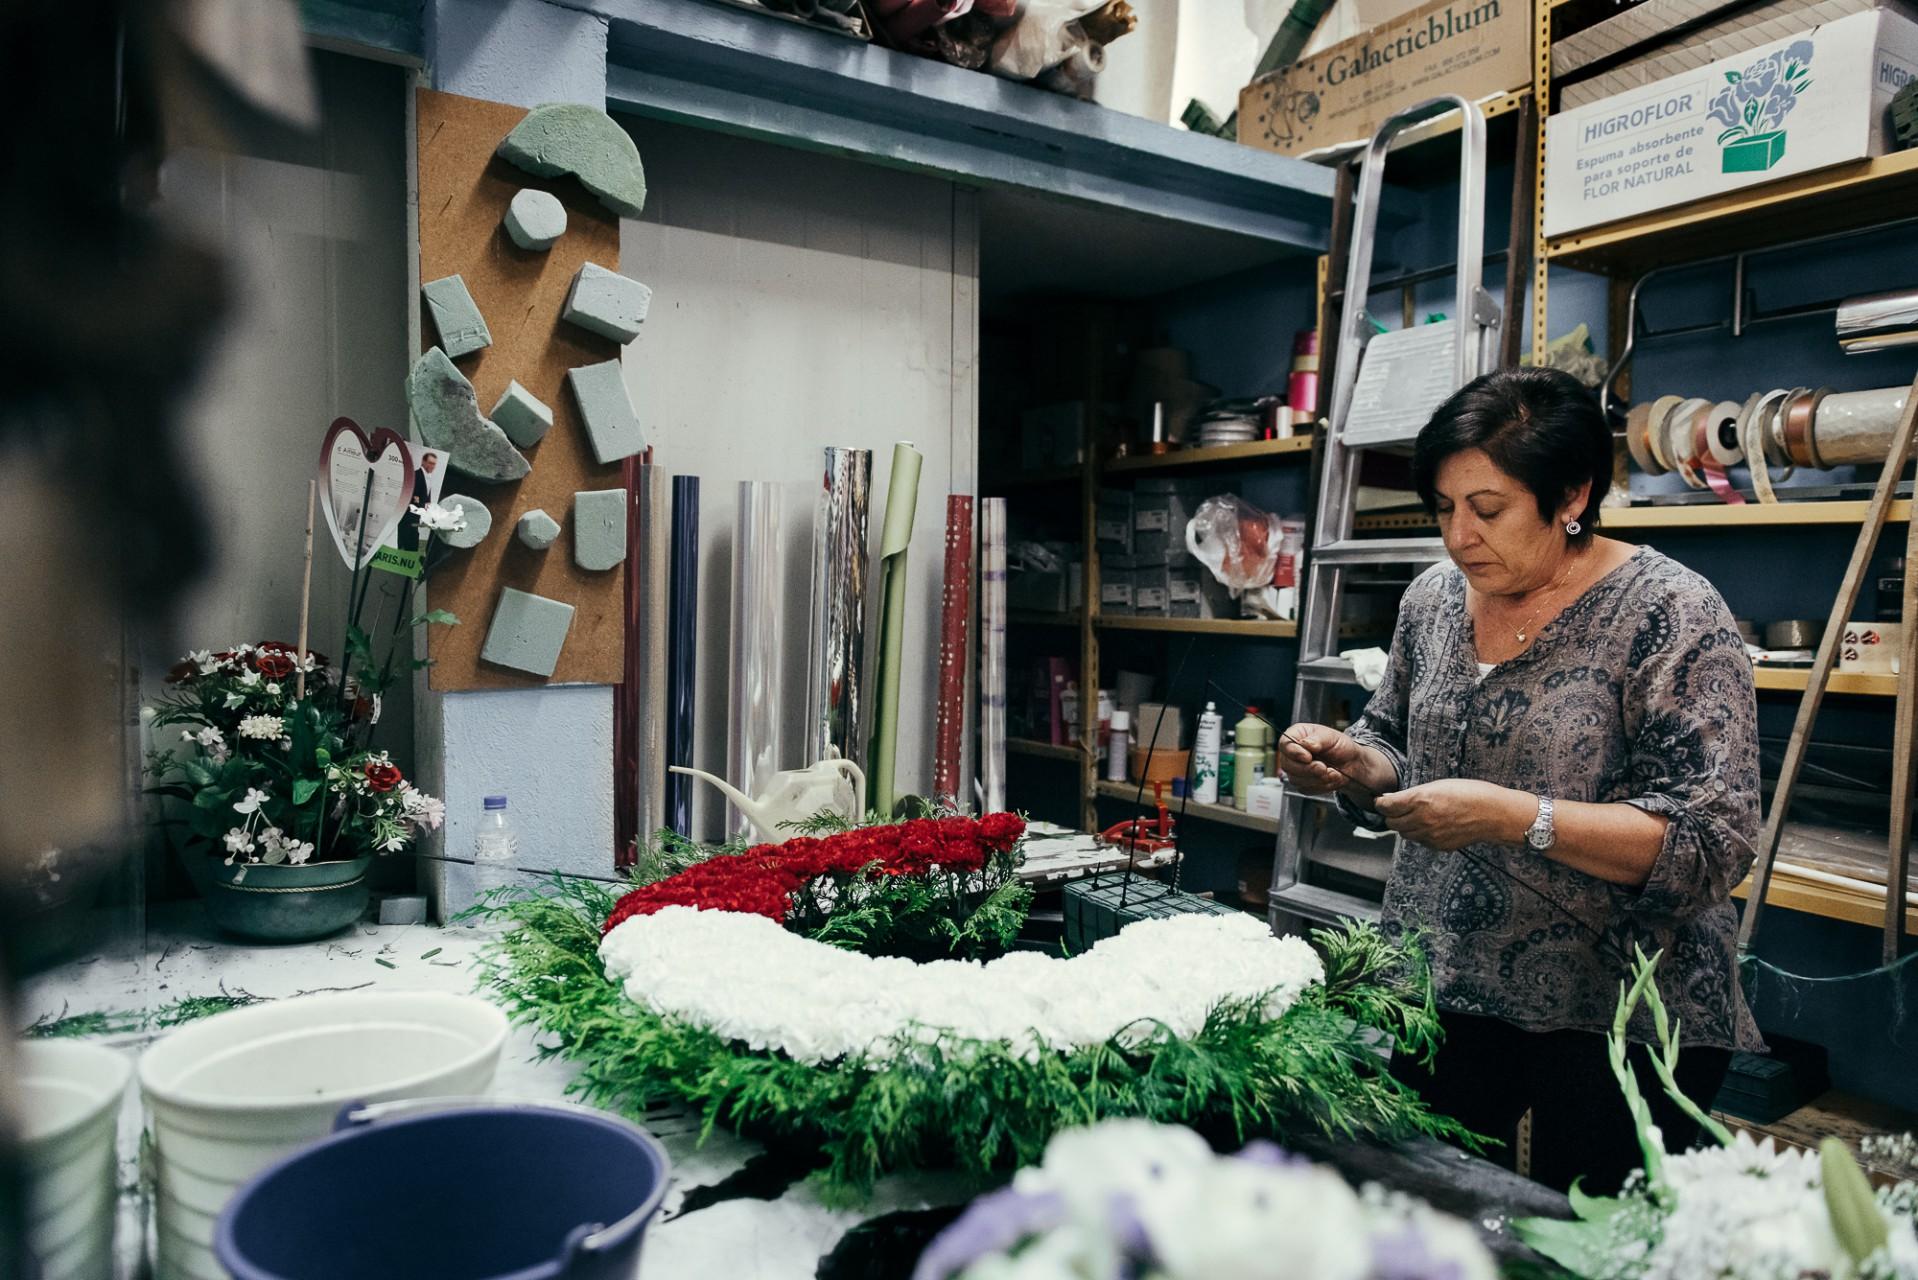 Ana Matos - sector funerario 2015-16